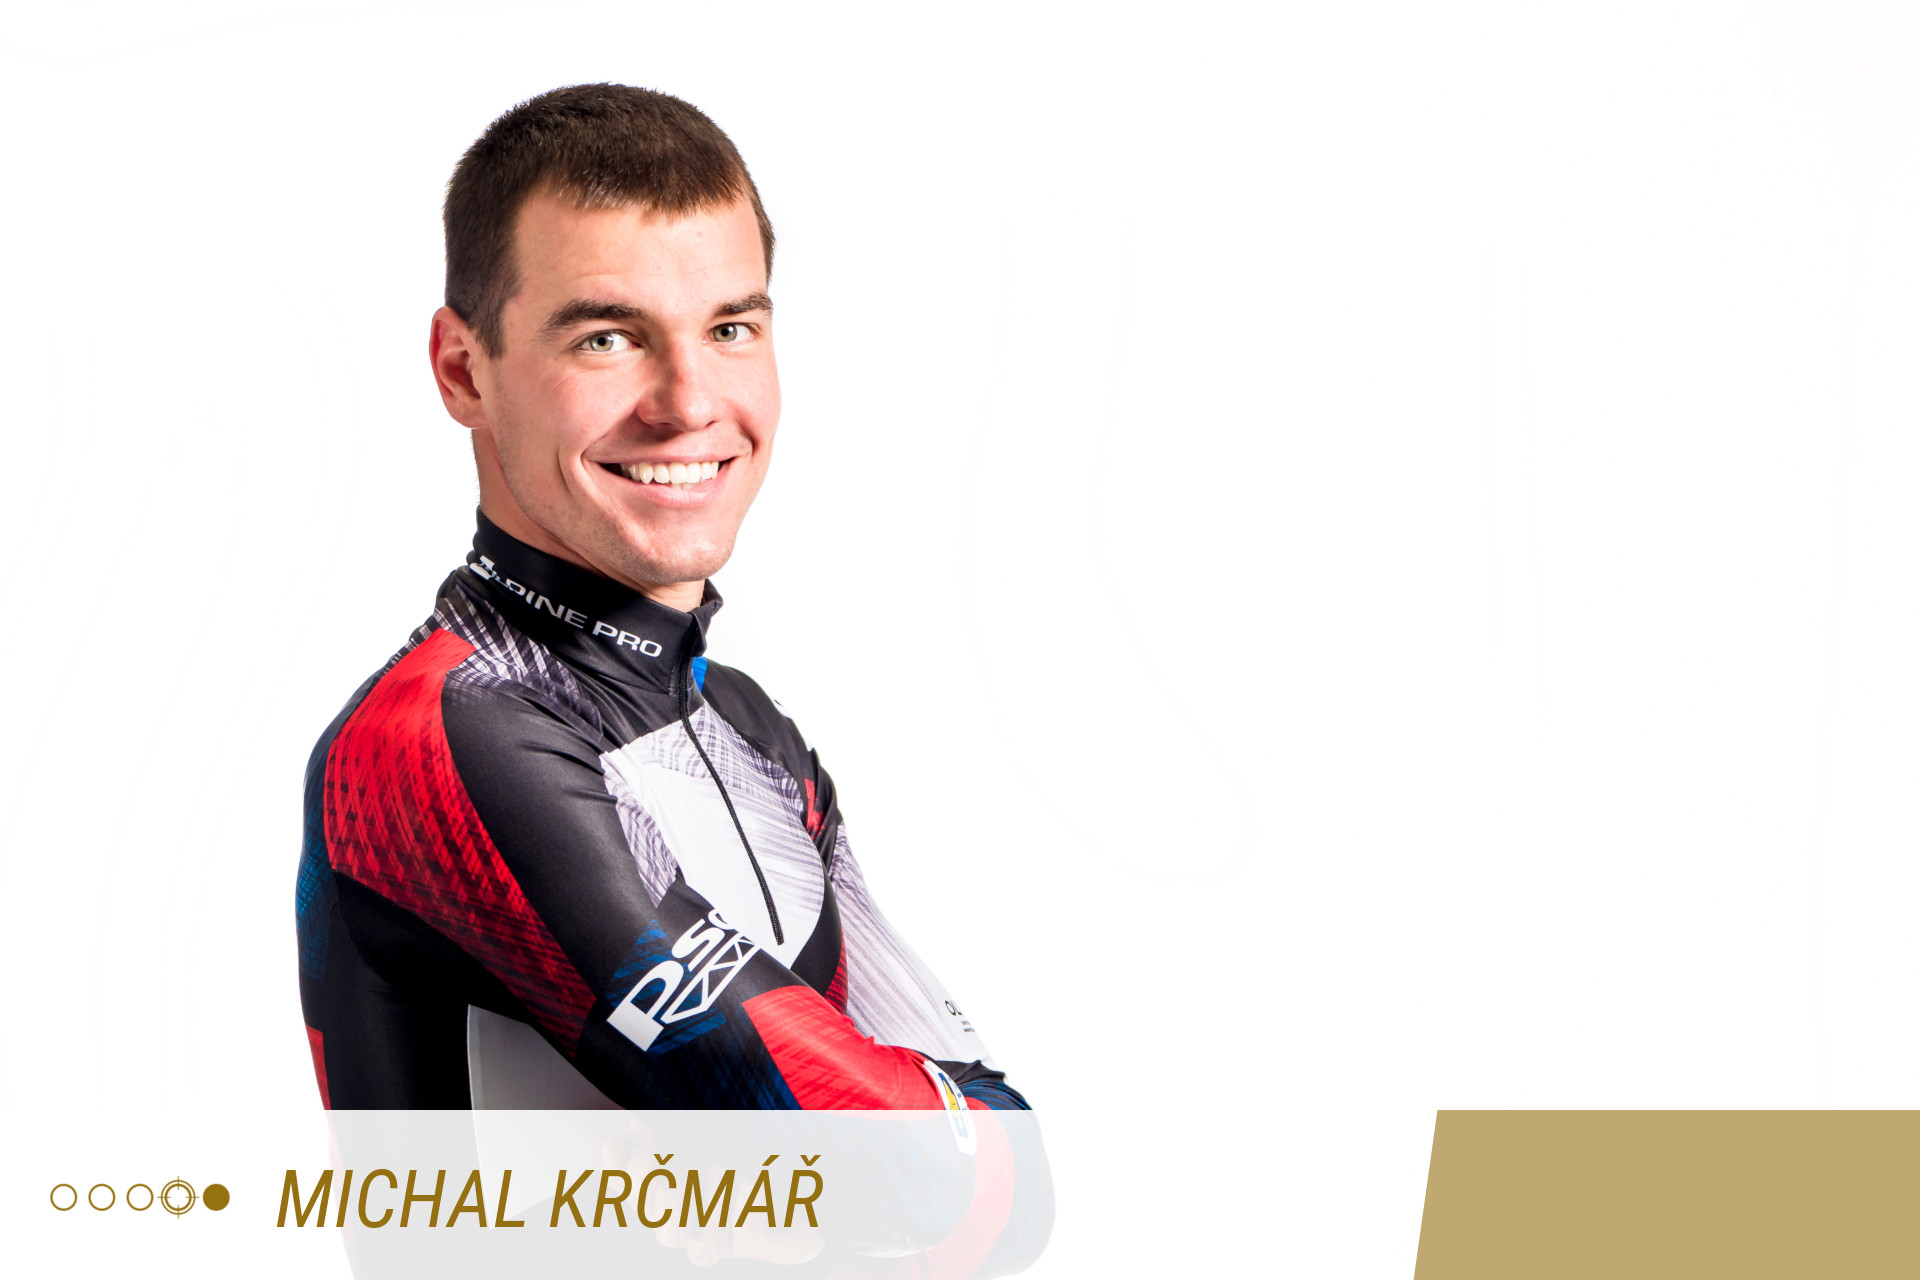 Athleten_MichalKrcmar